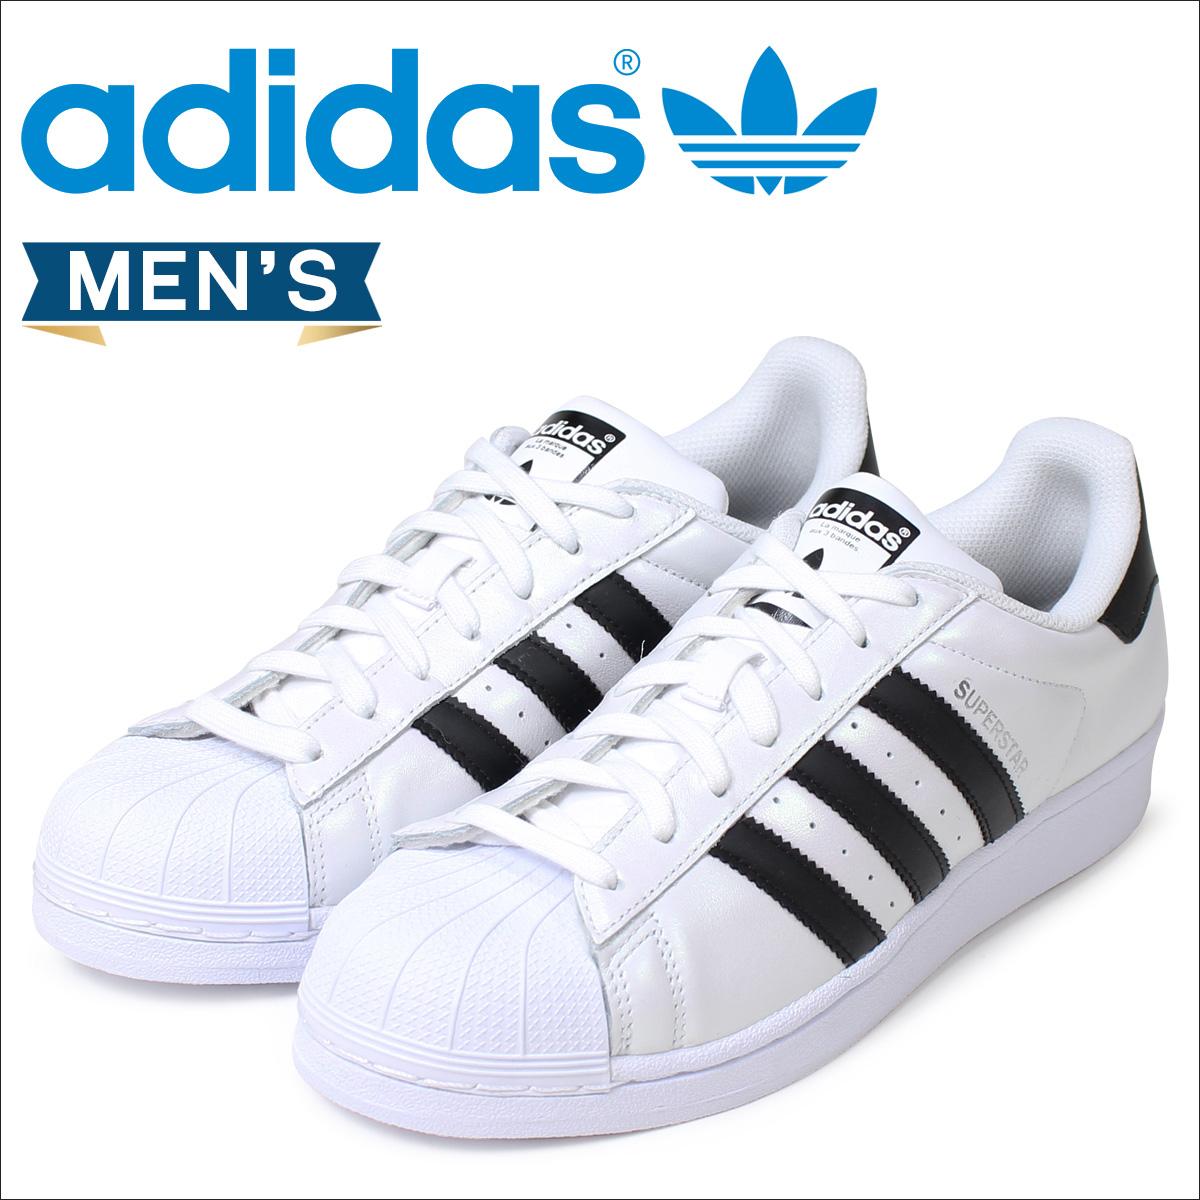 adidas classic superstar